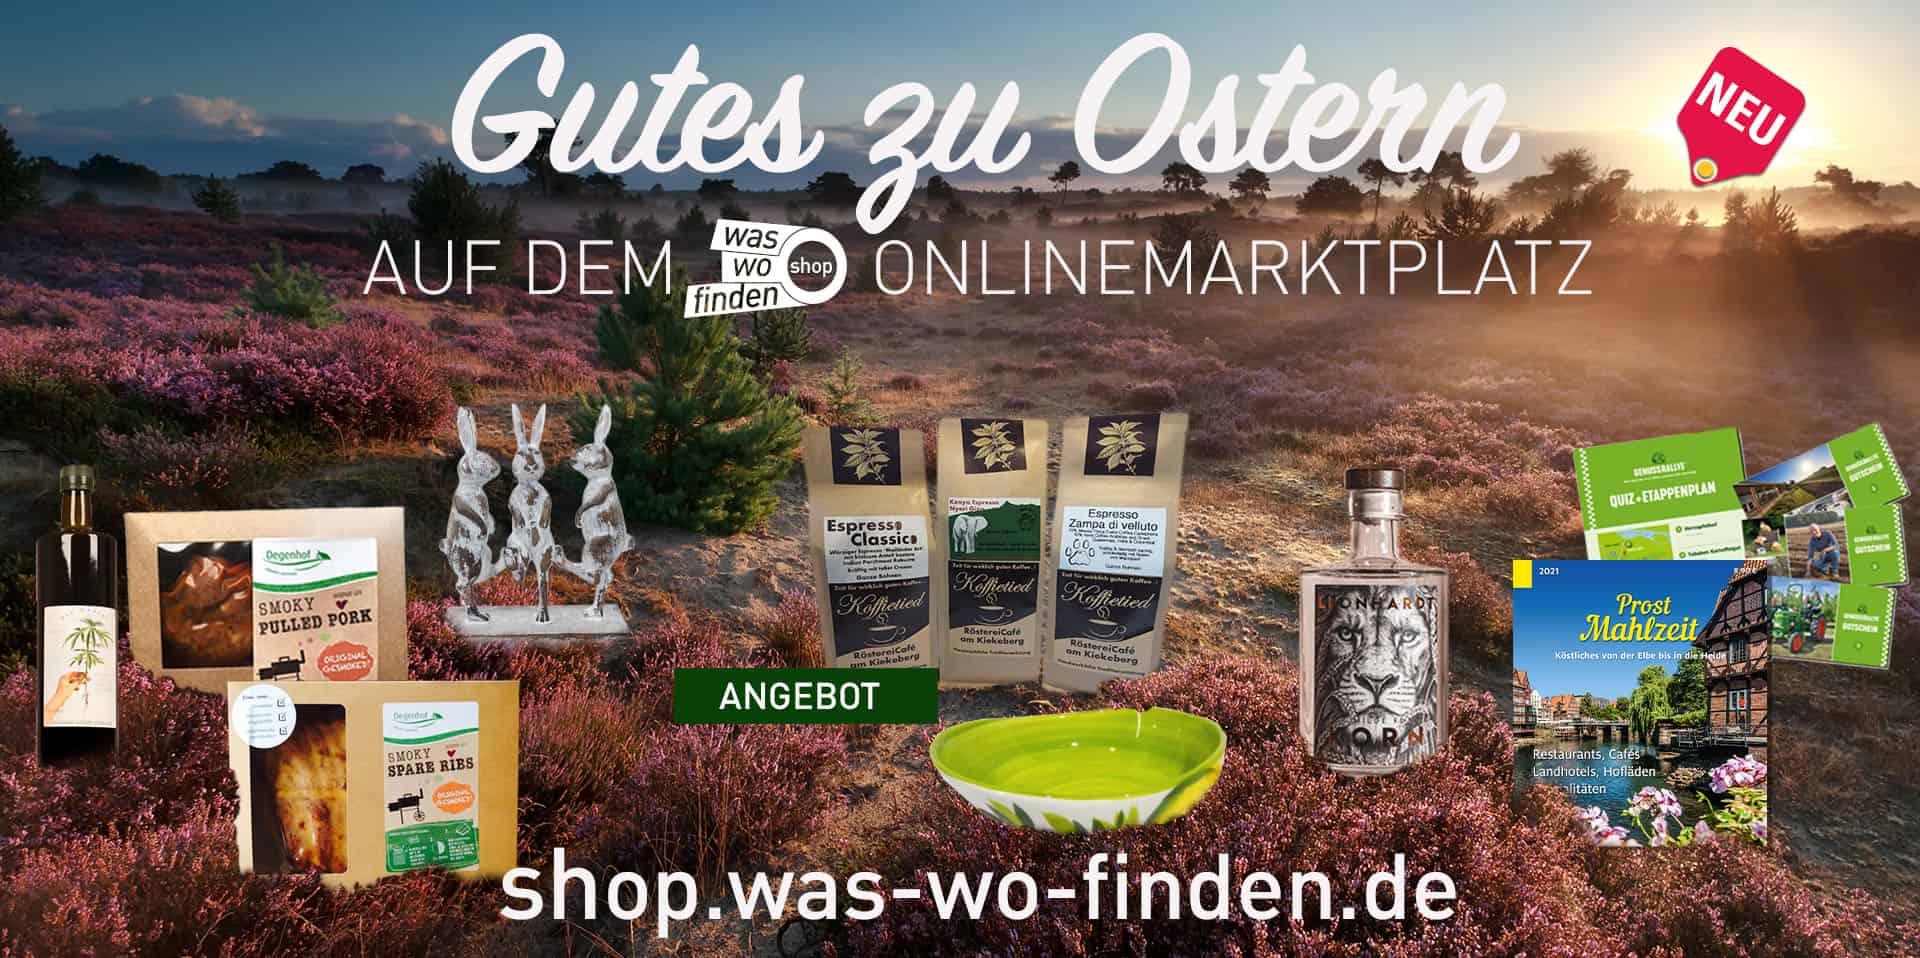 Click & Collect im Landkreis Harburg